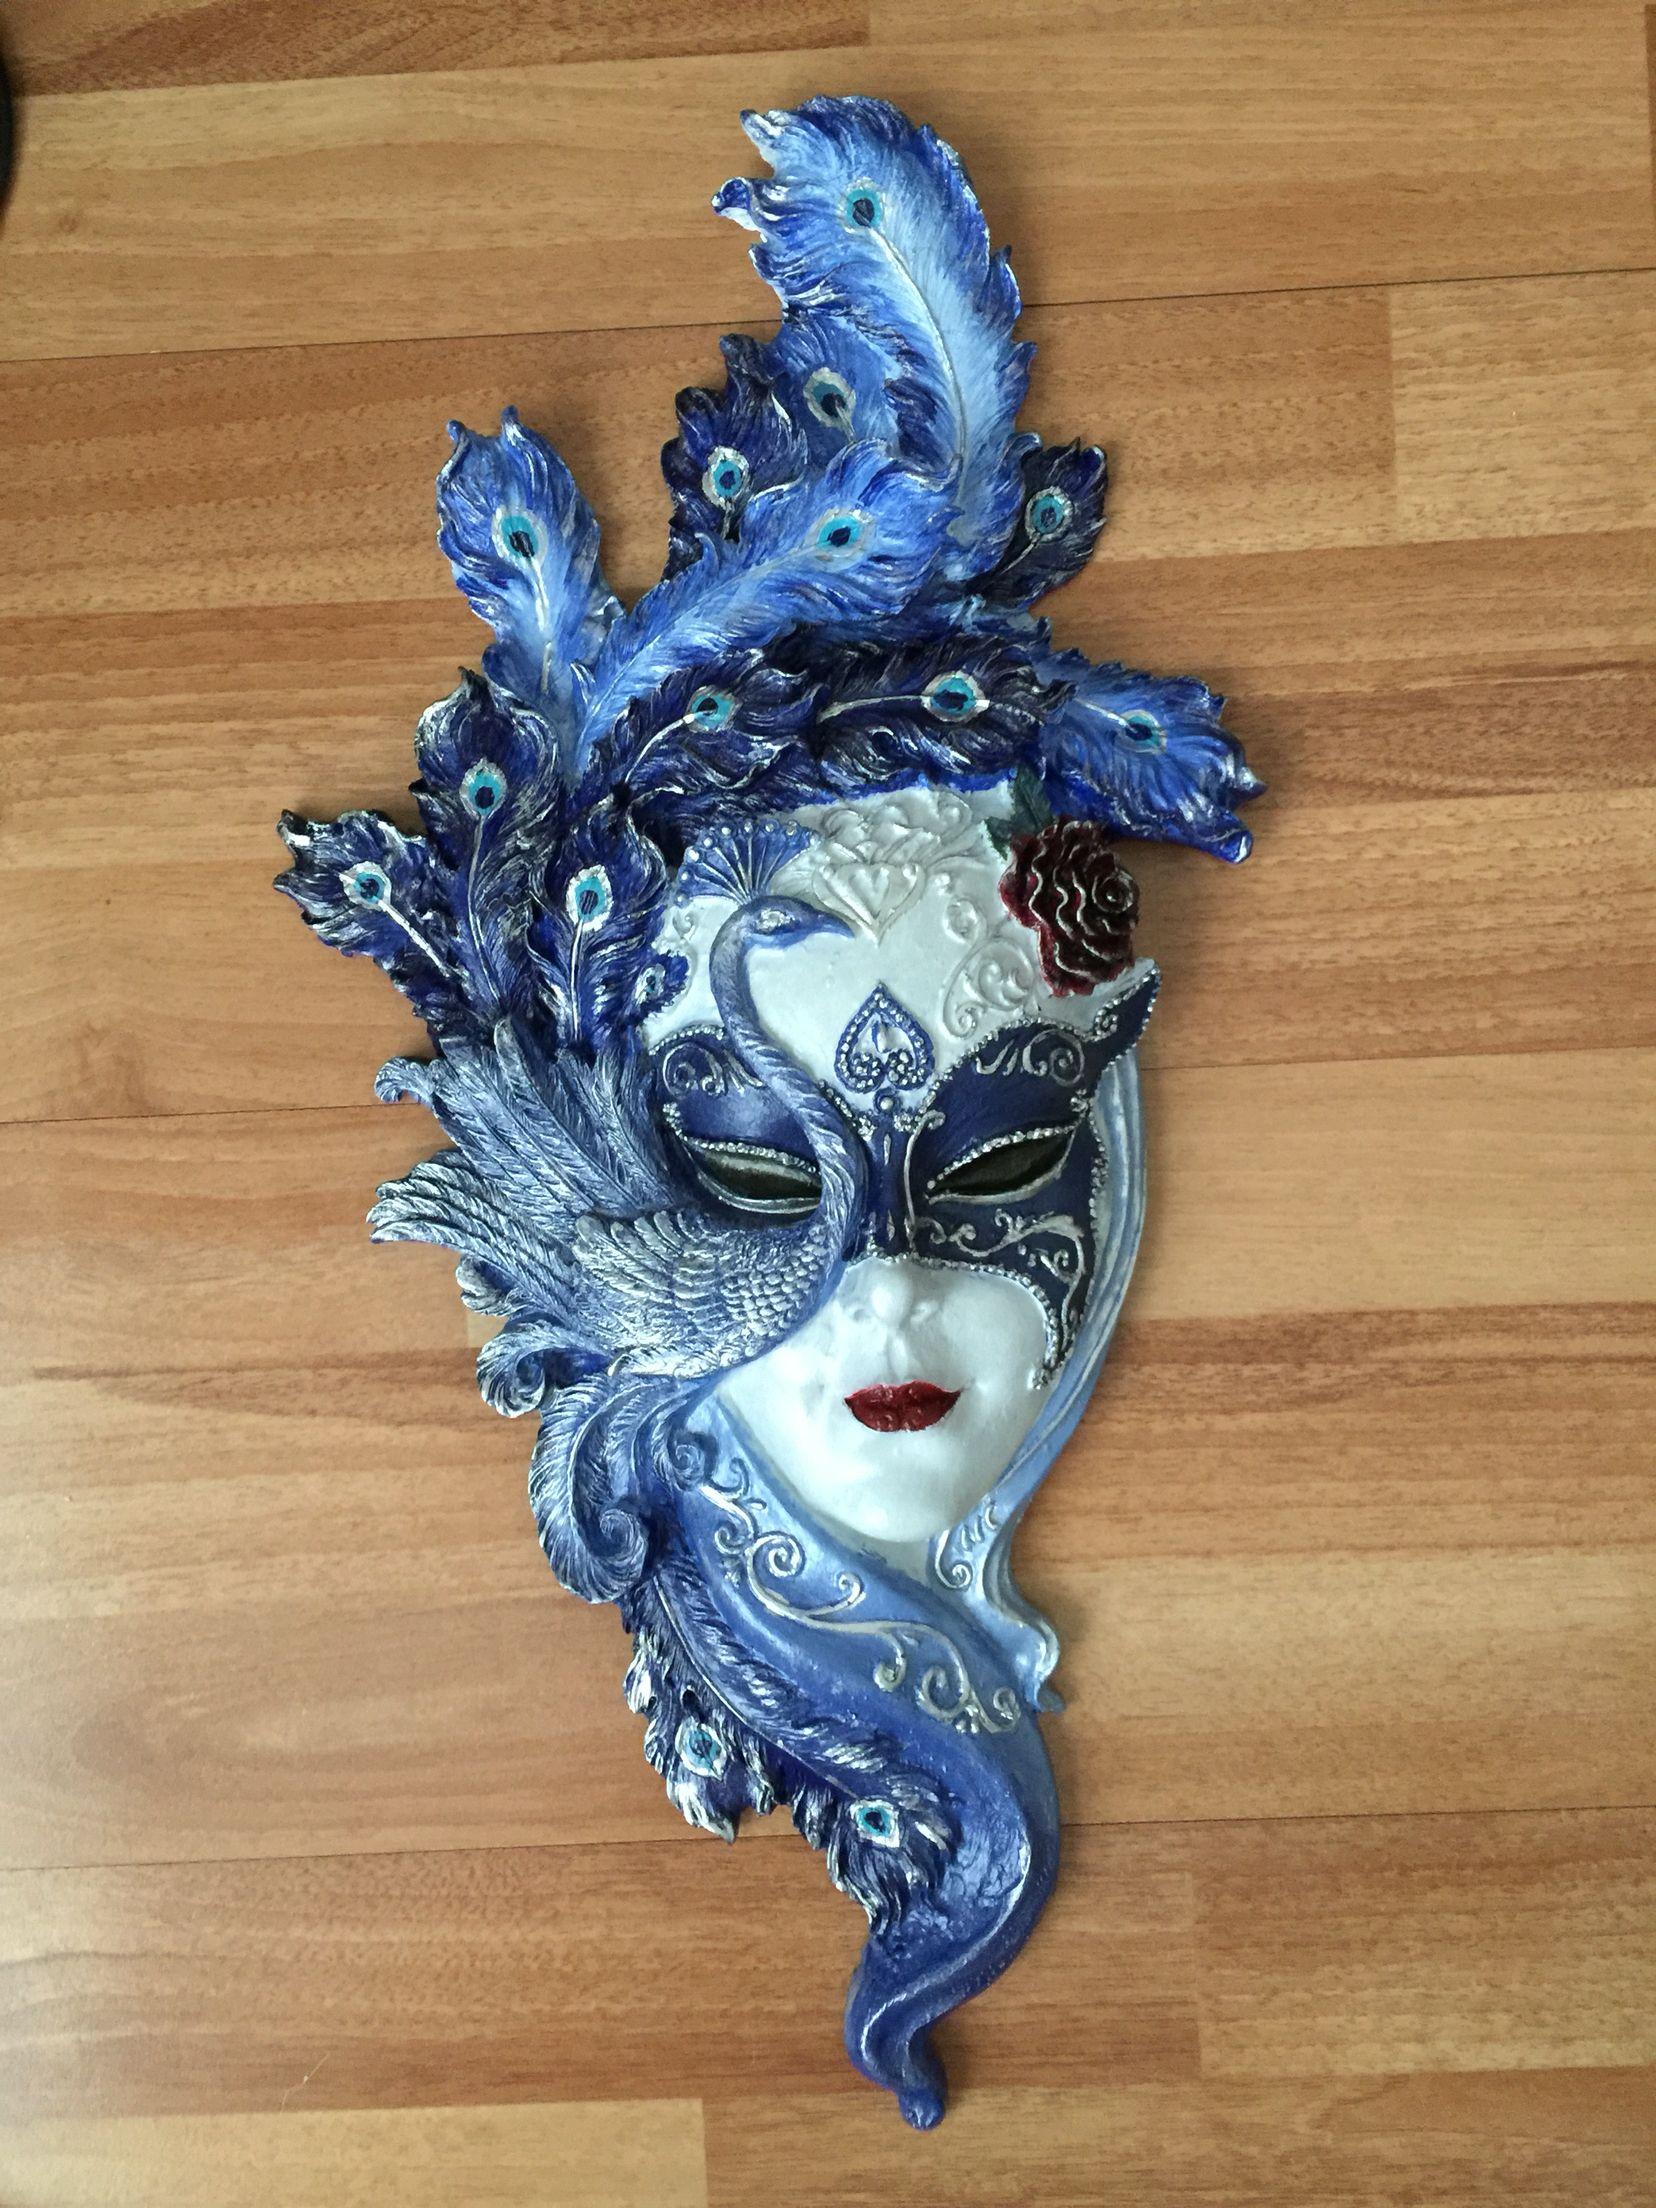 Polyester Mask Boyama Polyester Mask Polyestermask Boyama Ceramic Mask Carnival Masks Venetian Carnival Masks